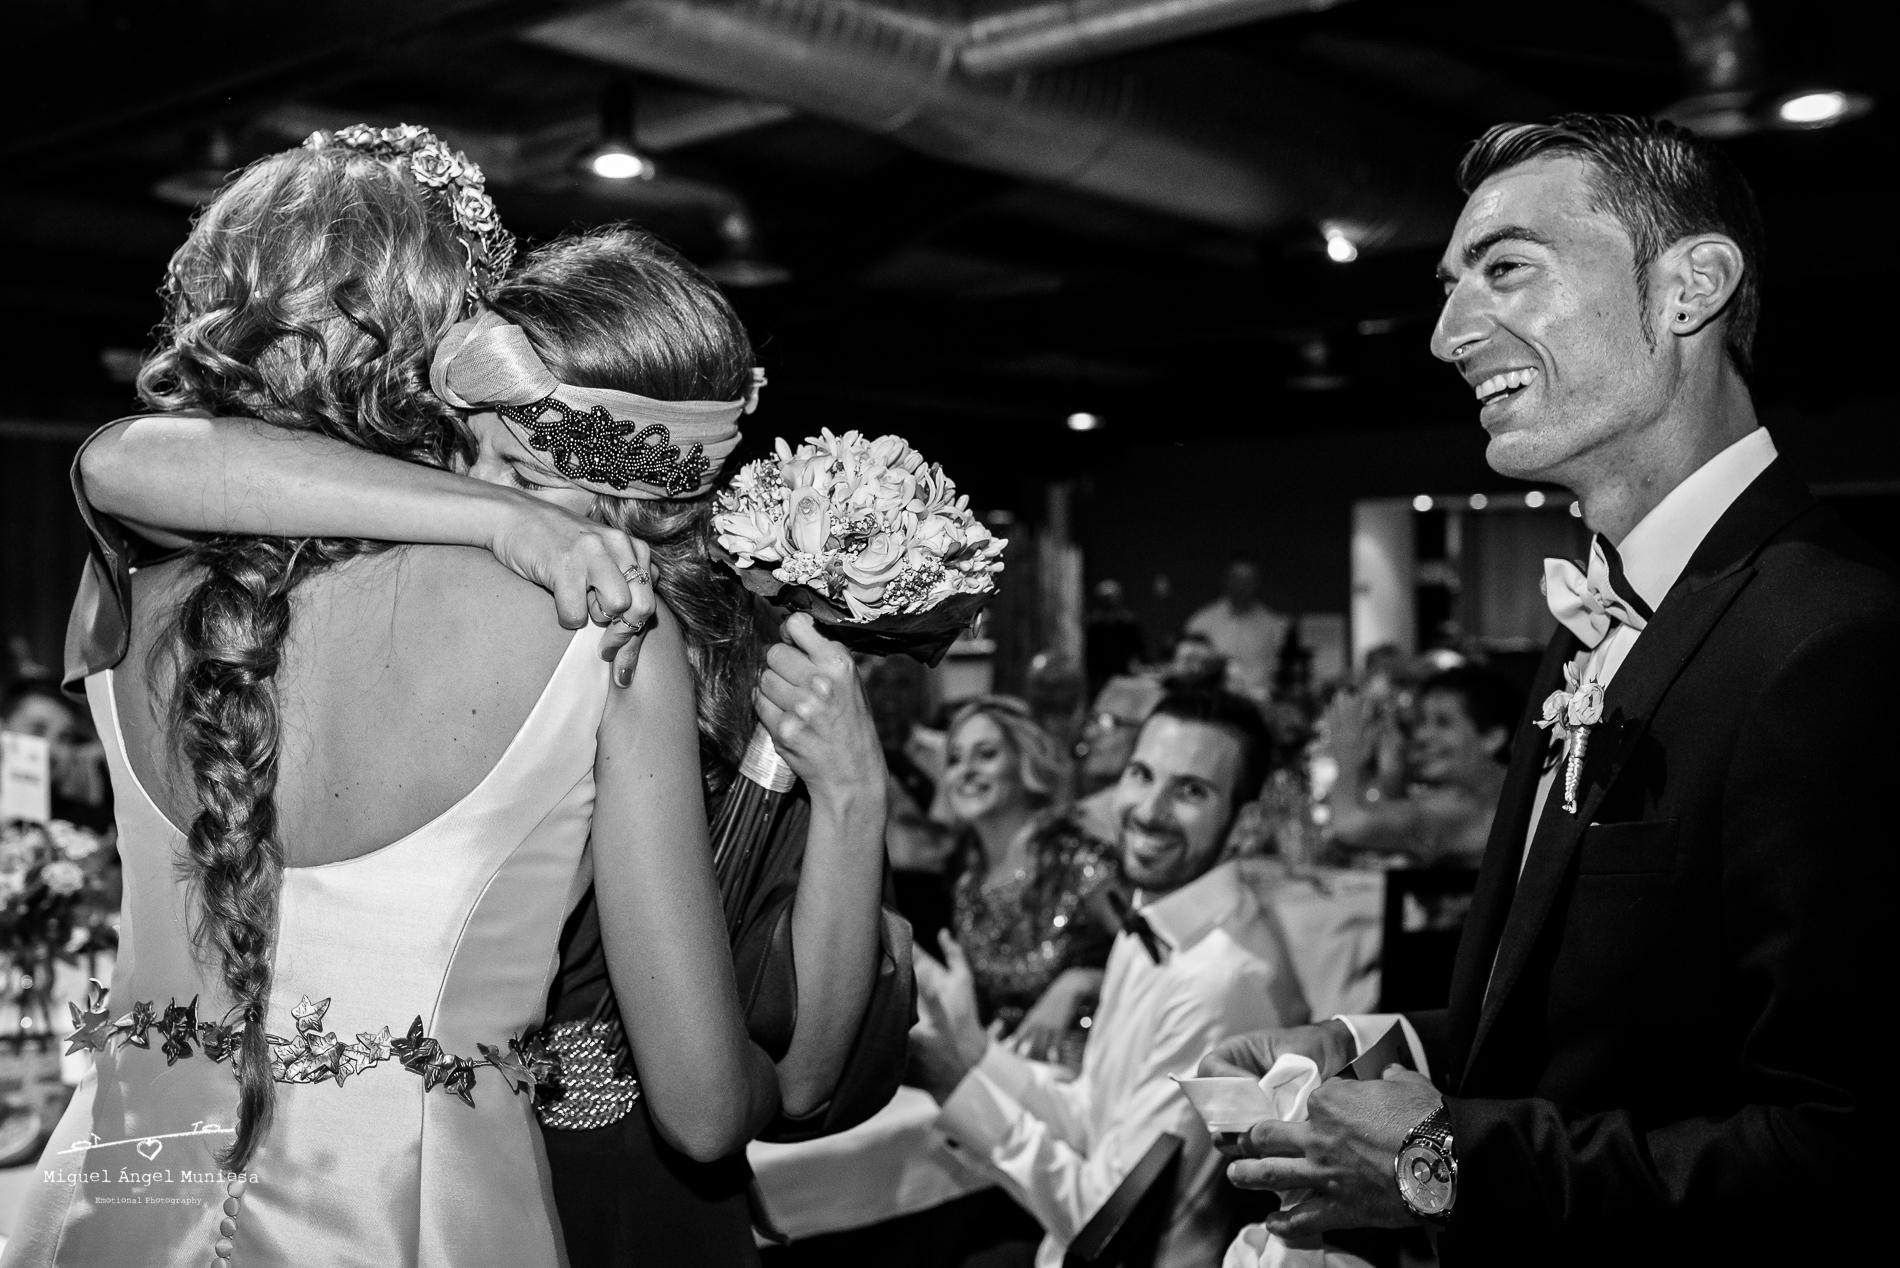 boda, fotografia de boda, boda zaragoza, fotografia, wedding, wedding photography, miguel angel muniesa, fotografo boda Zaragoza, fotografo boda, destination wedding_ 042